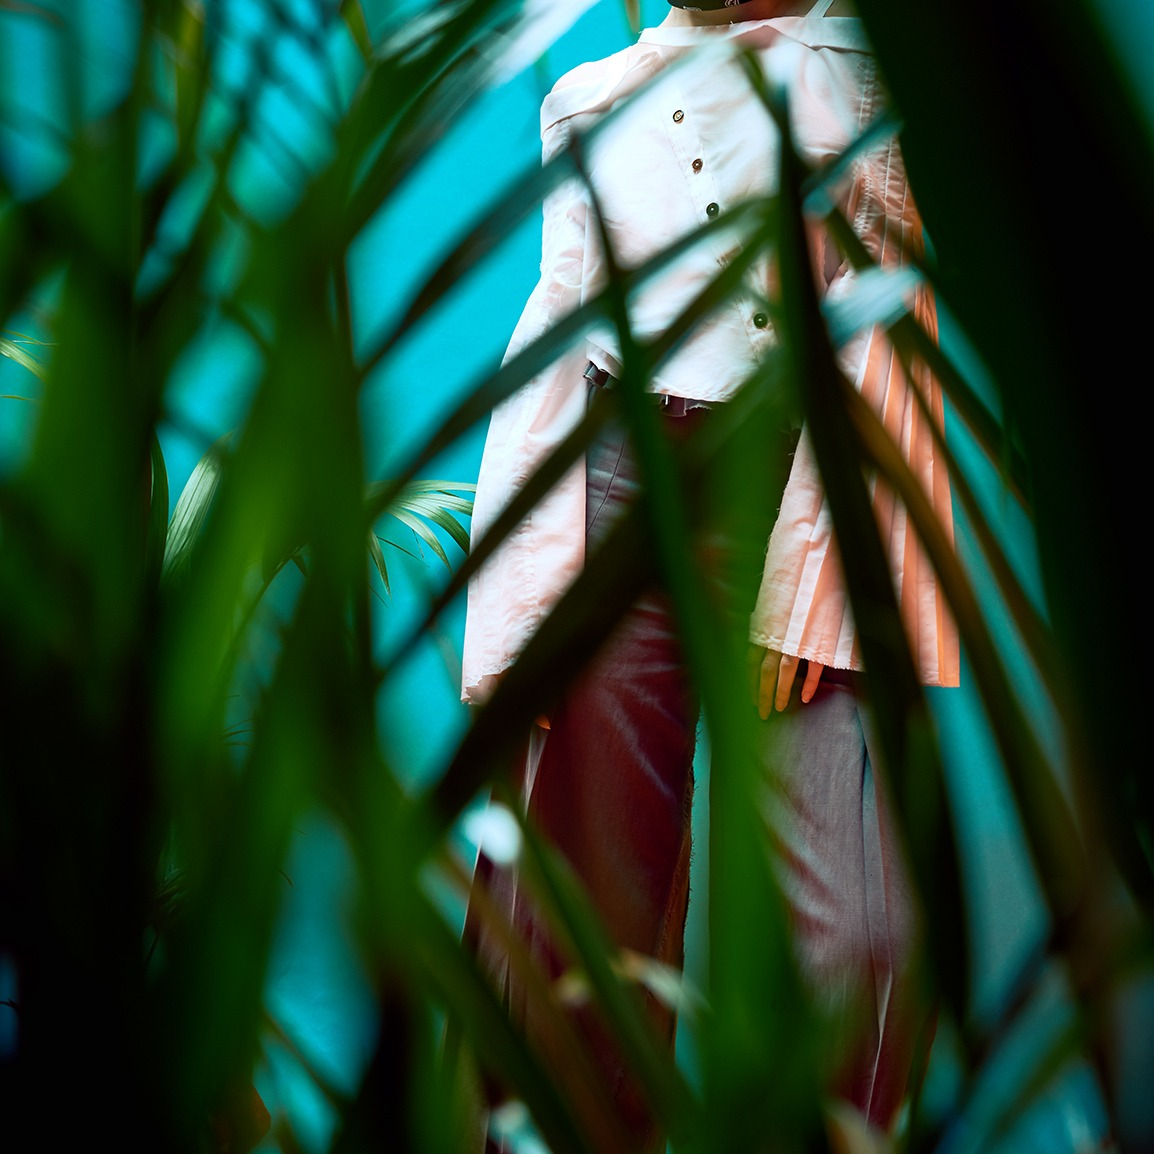 Modefotografie straubmuellerstudios Stuttgart frau körper